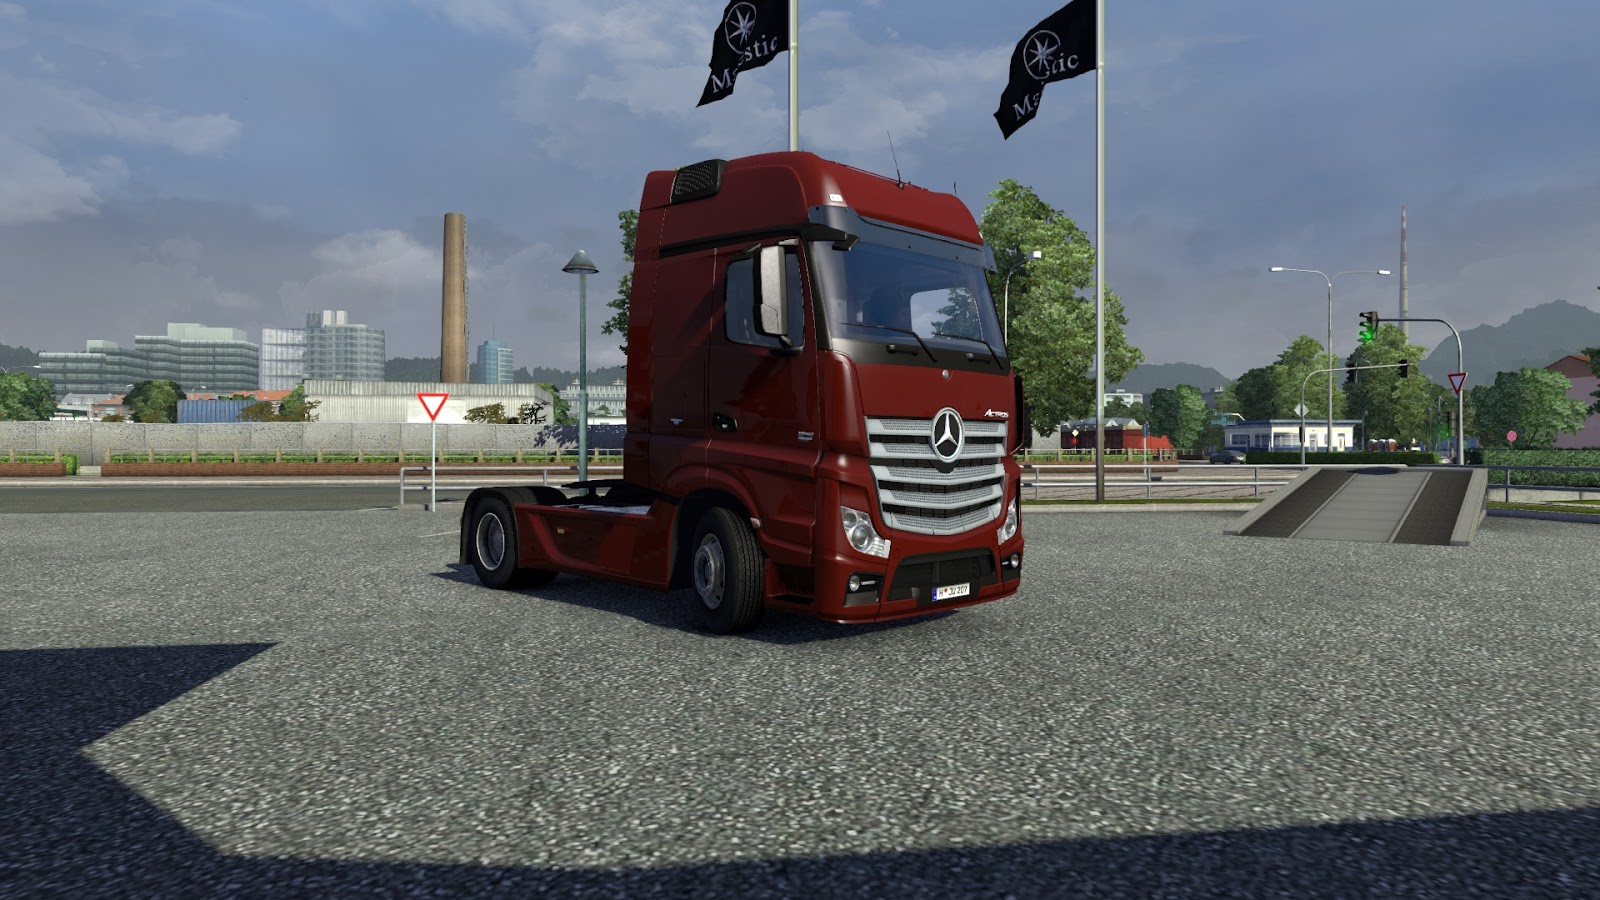 Truck Simulator 2 CHOMIKUJ + MODY DO GRY - marcinb180 - Chomikuj.pl